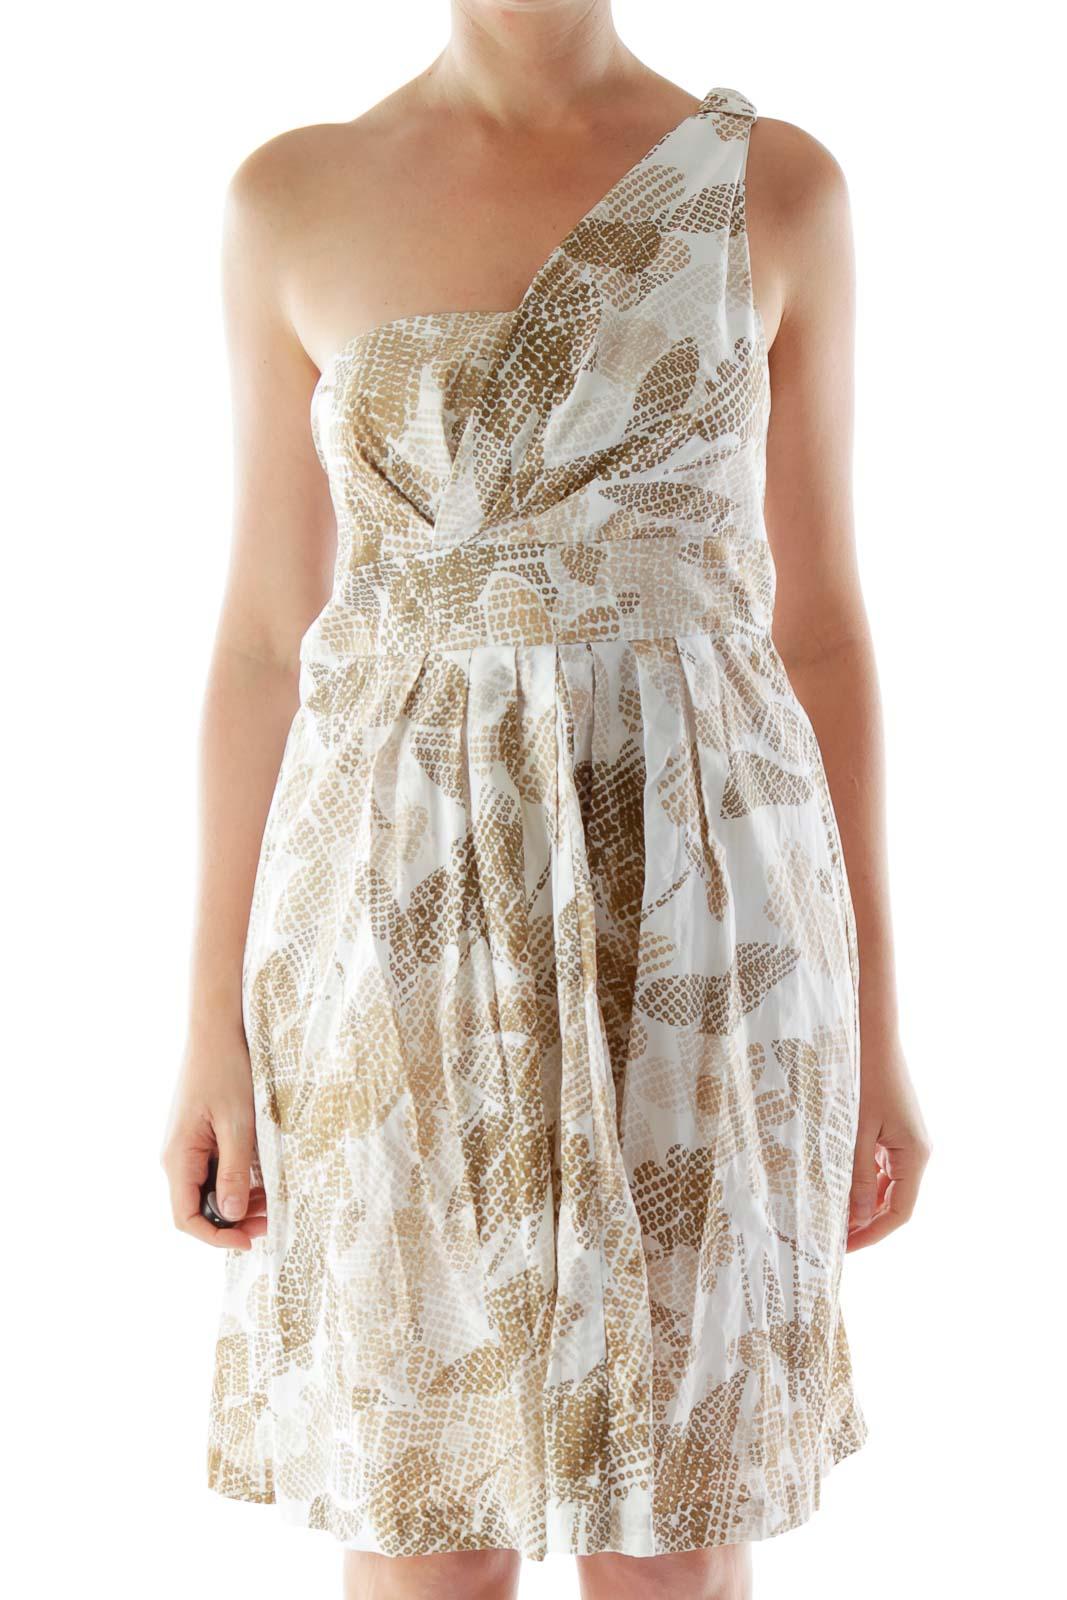 Brown Beige Cream One-Shoulder Flared Dress Front